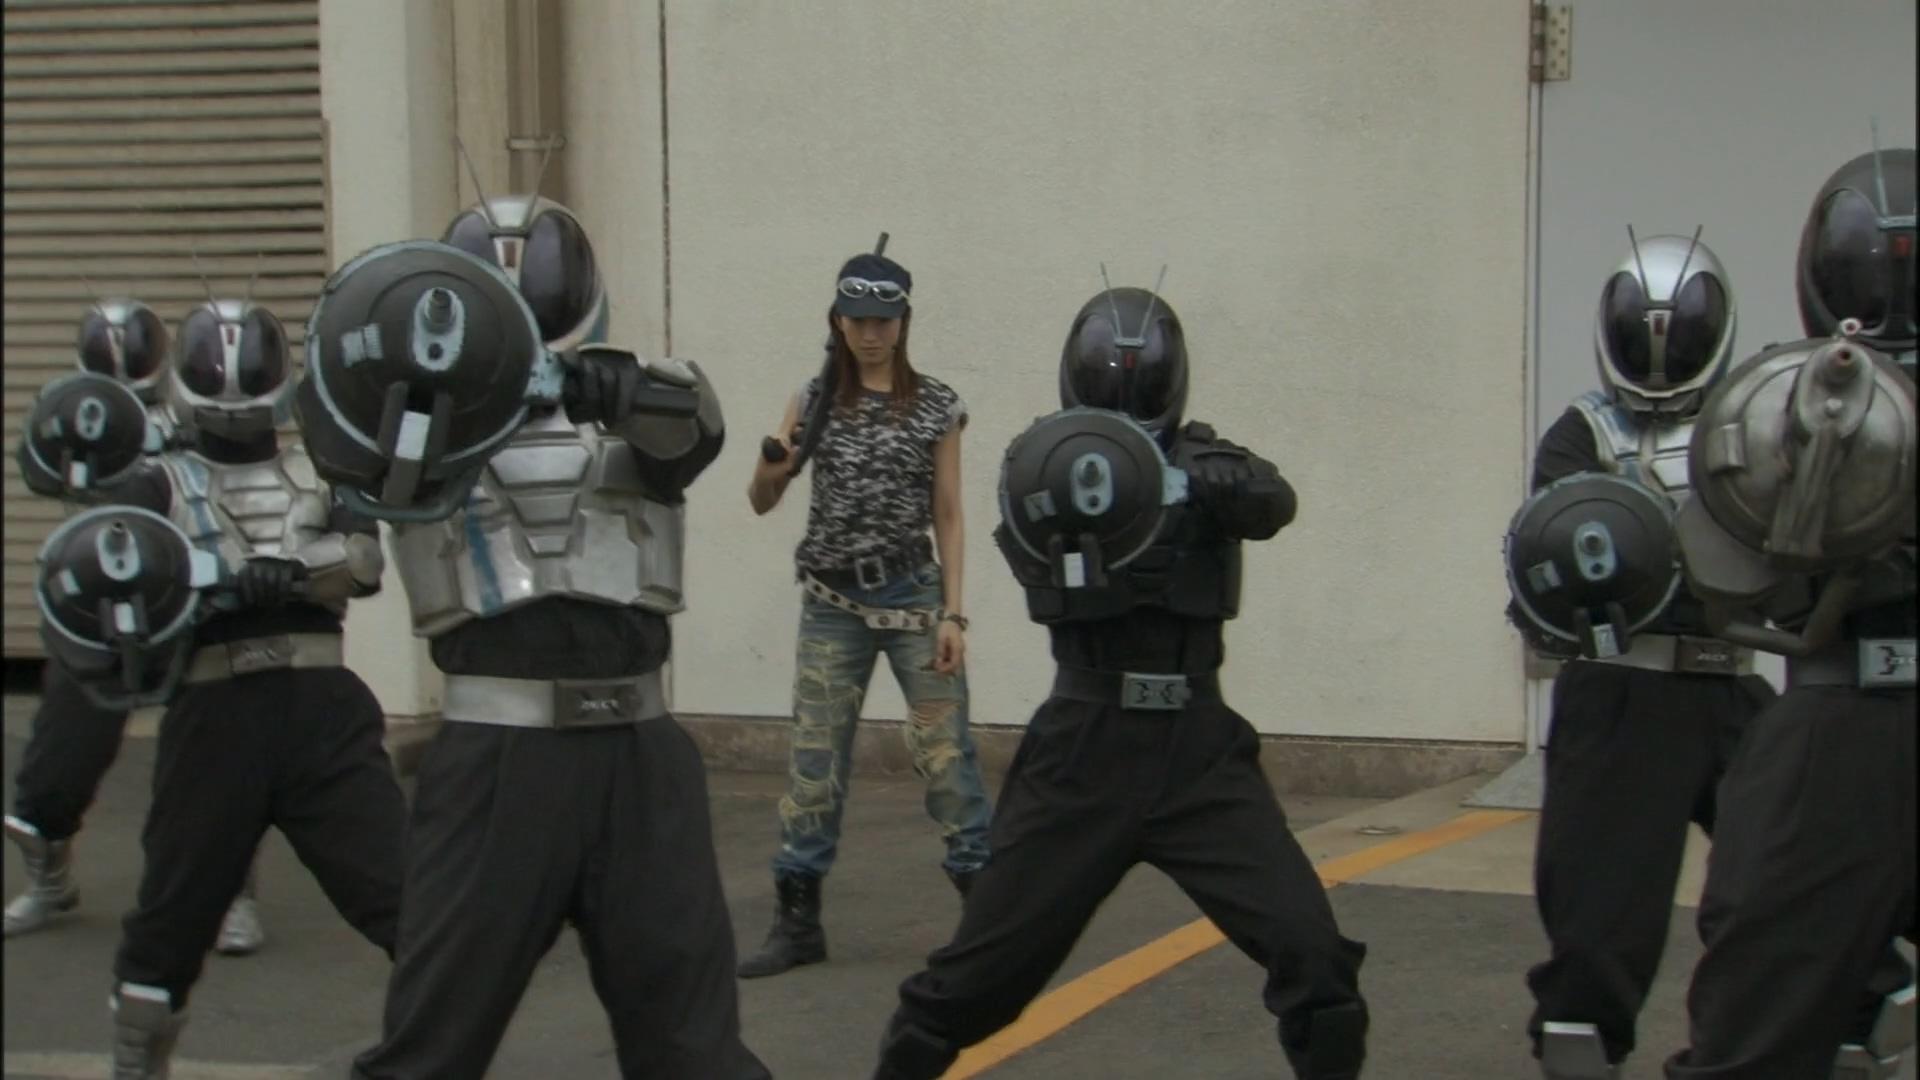 Neotroopers